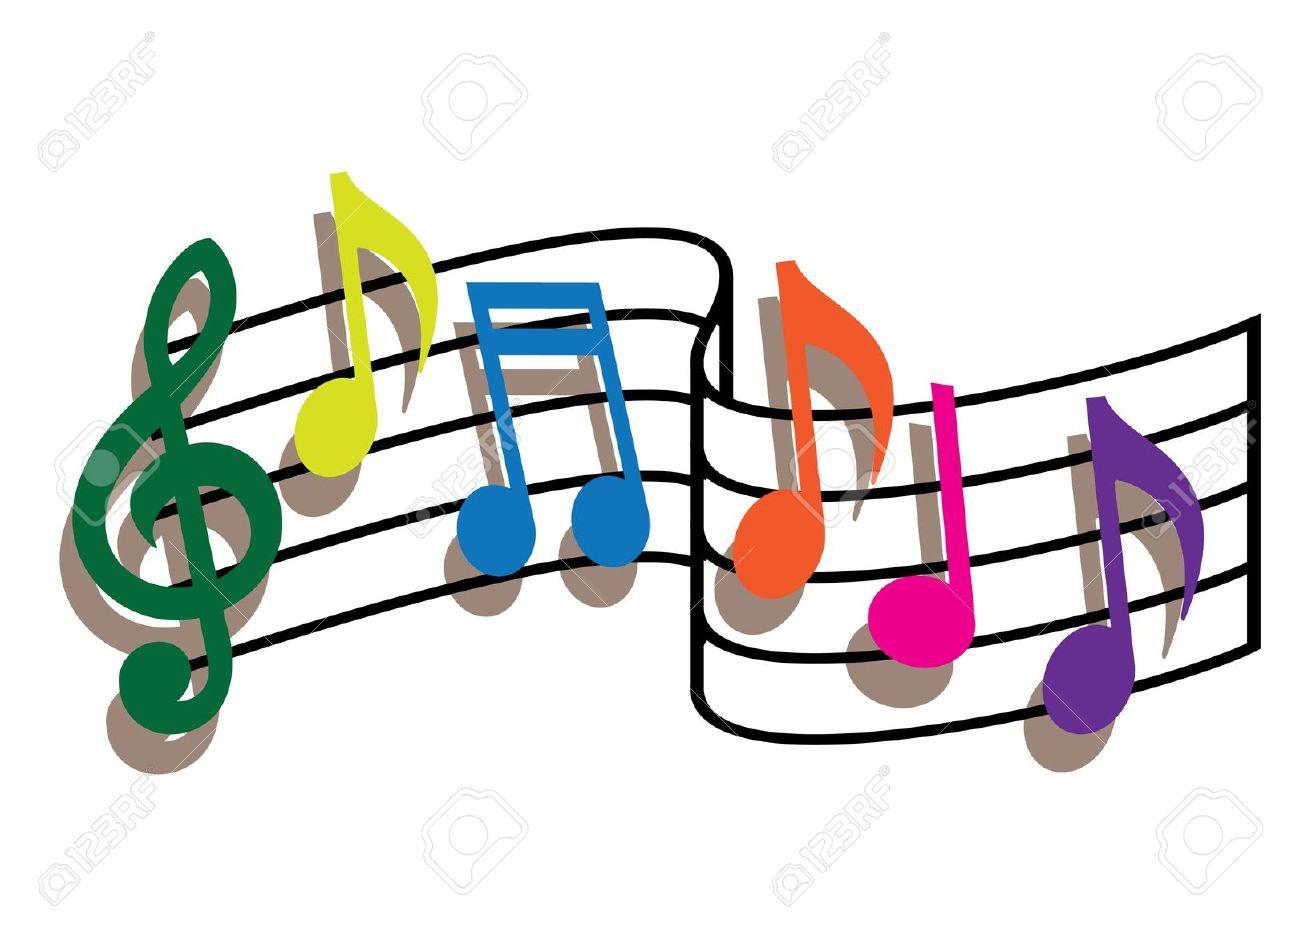 Music Note Pics.